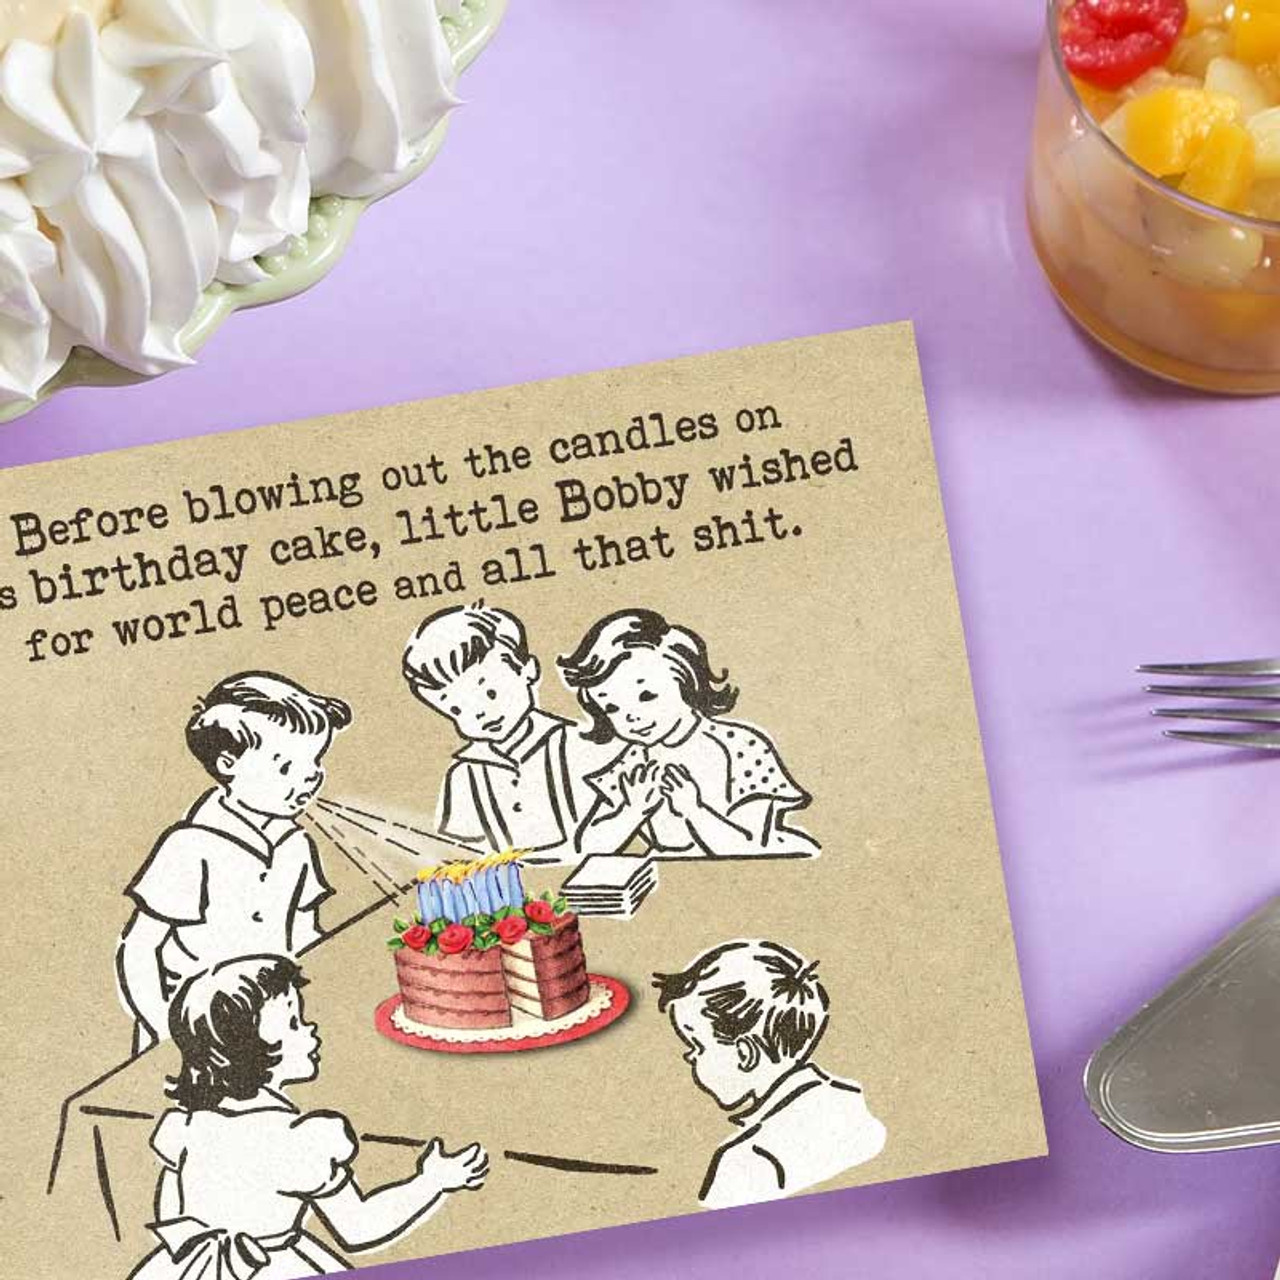 Retro Birthday Card for World Peace